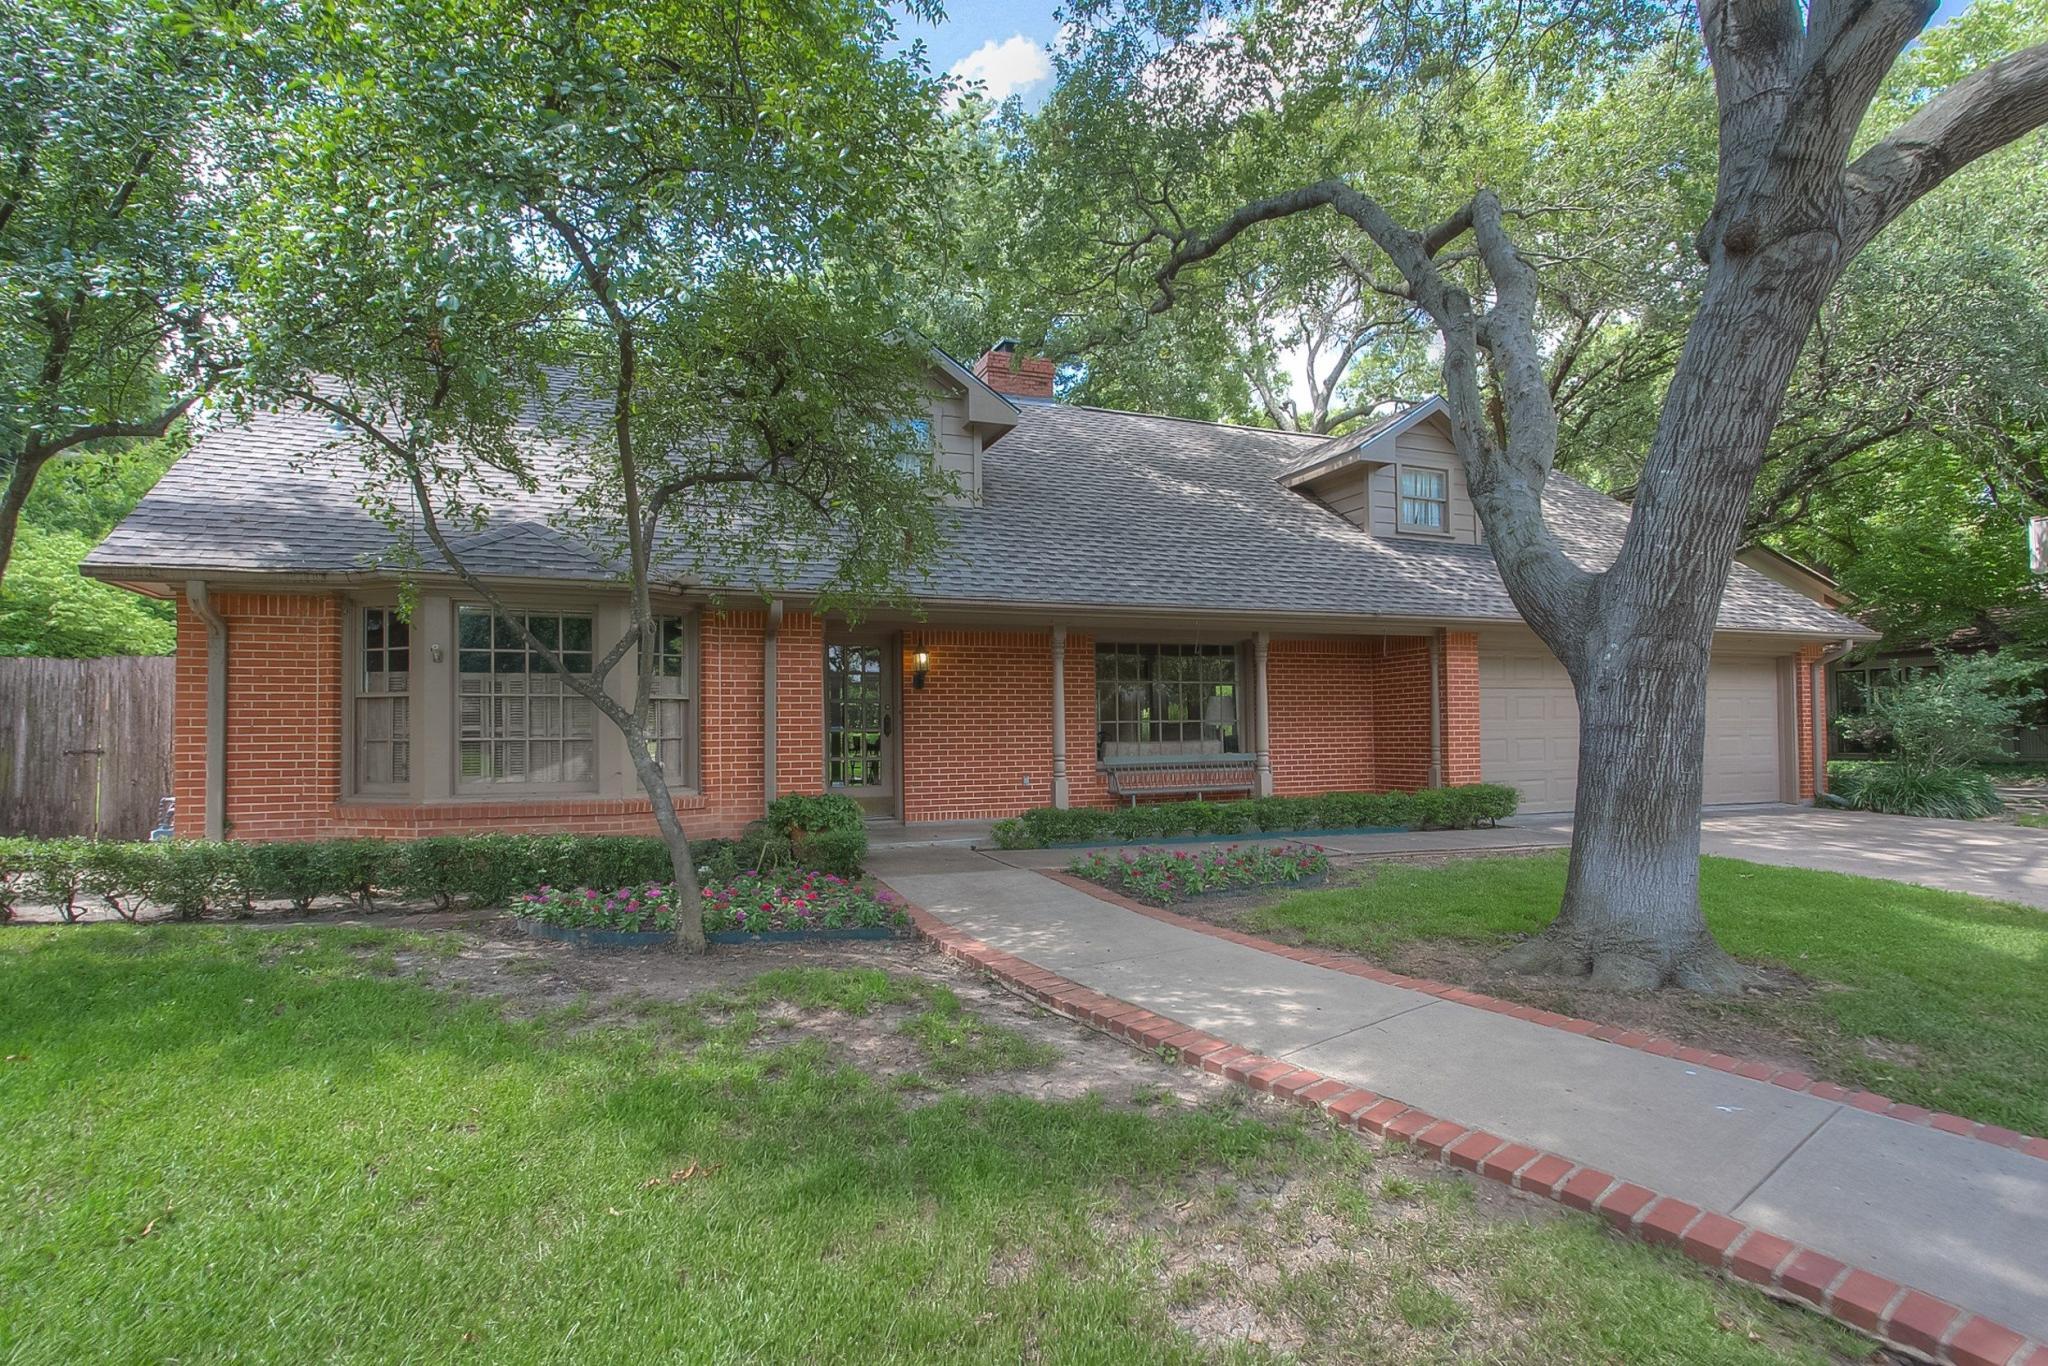 5309 El Dorado Dr Fort Worth TX Estimate and Home Details